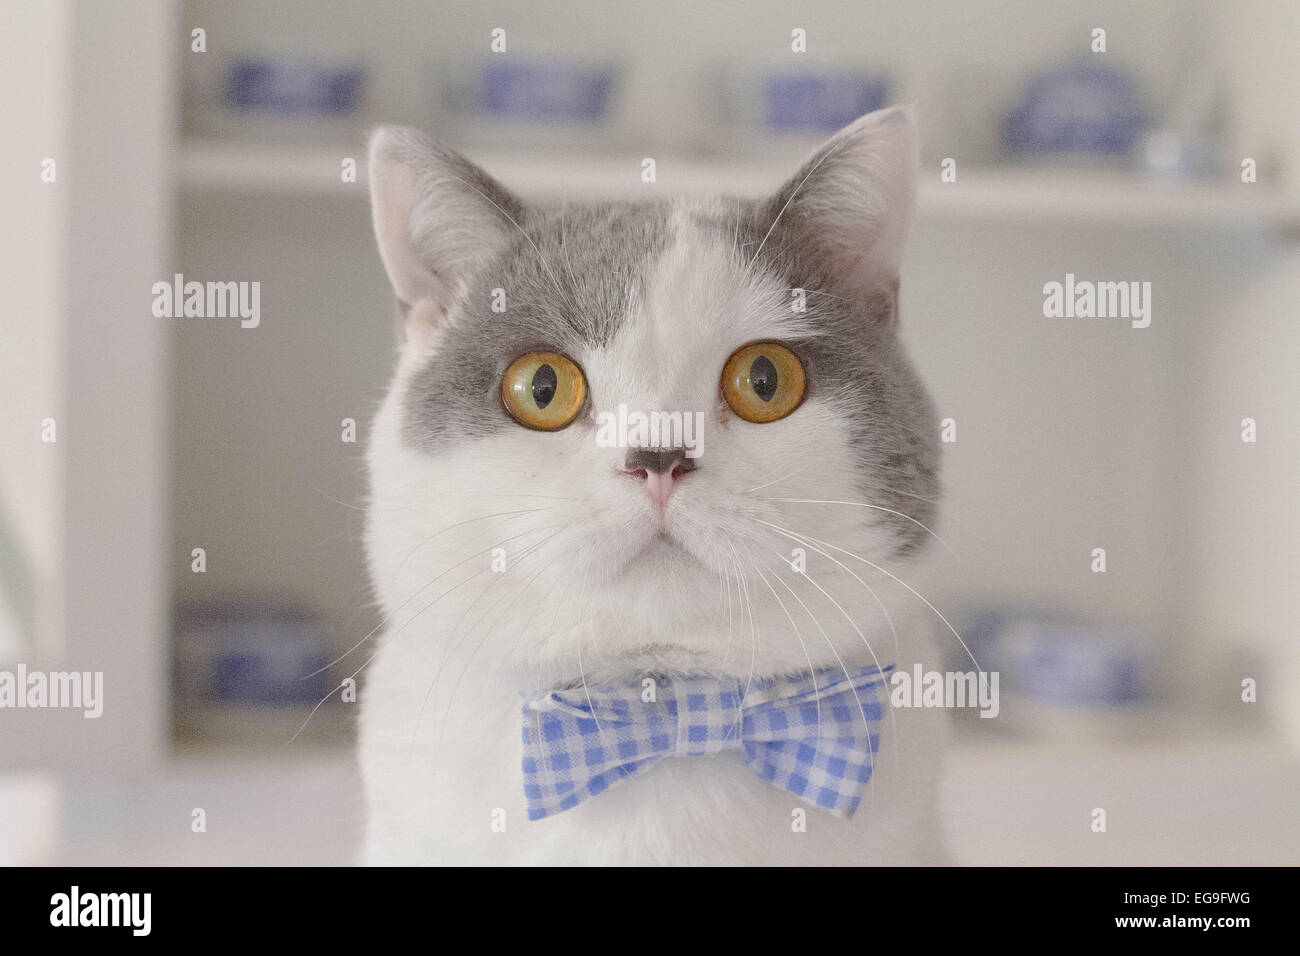 Portrait of cat wearing bow tie - Stock Image